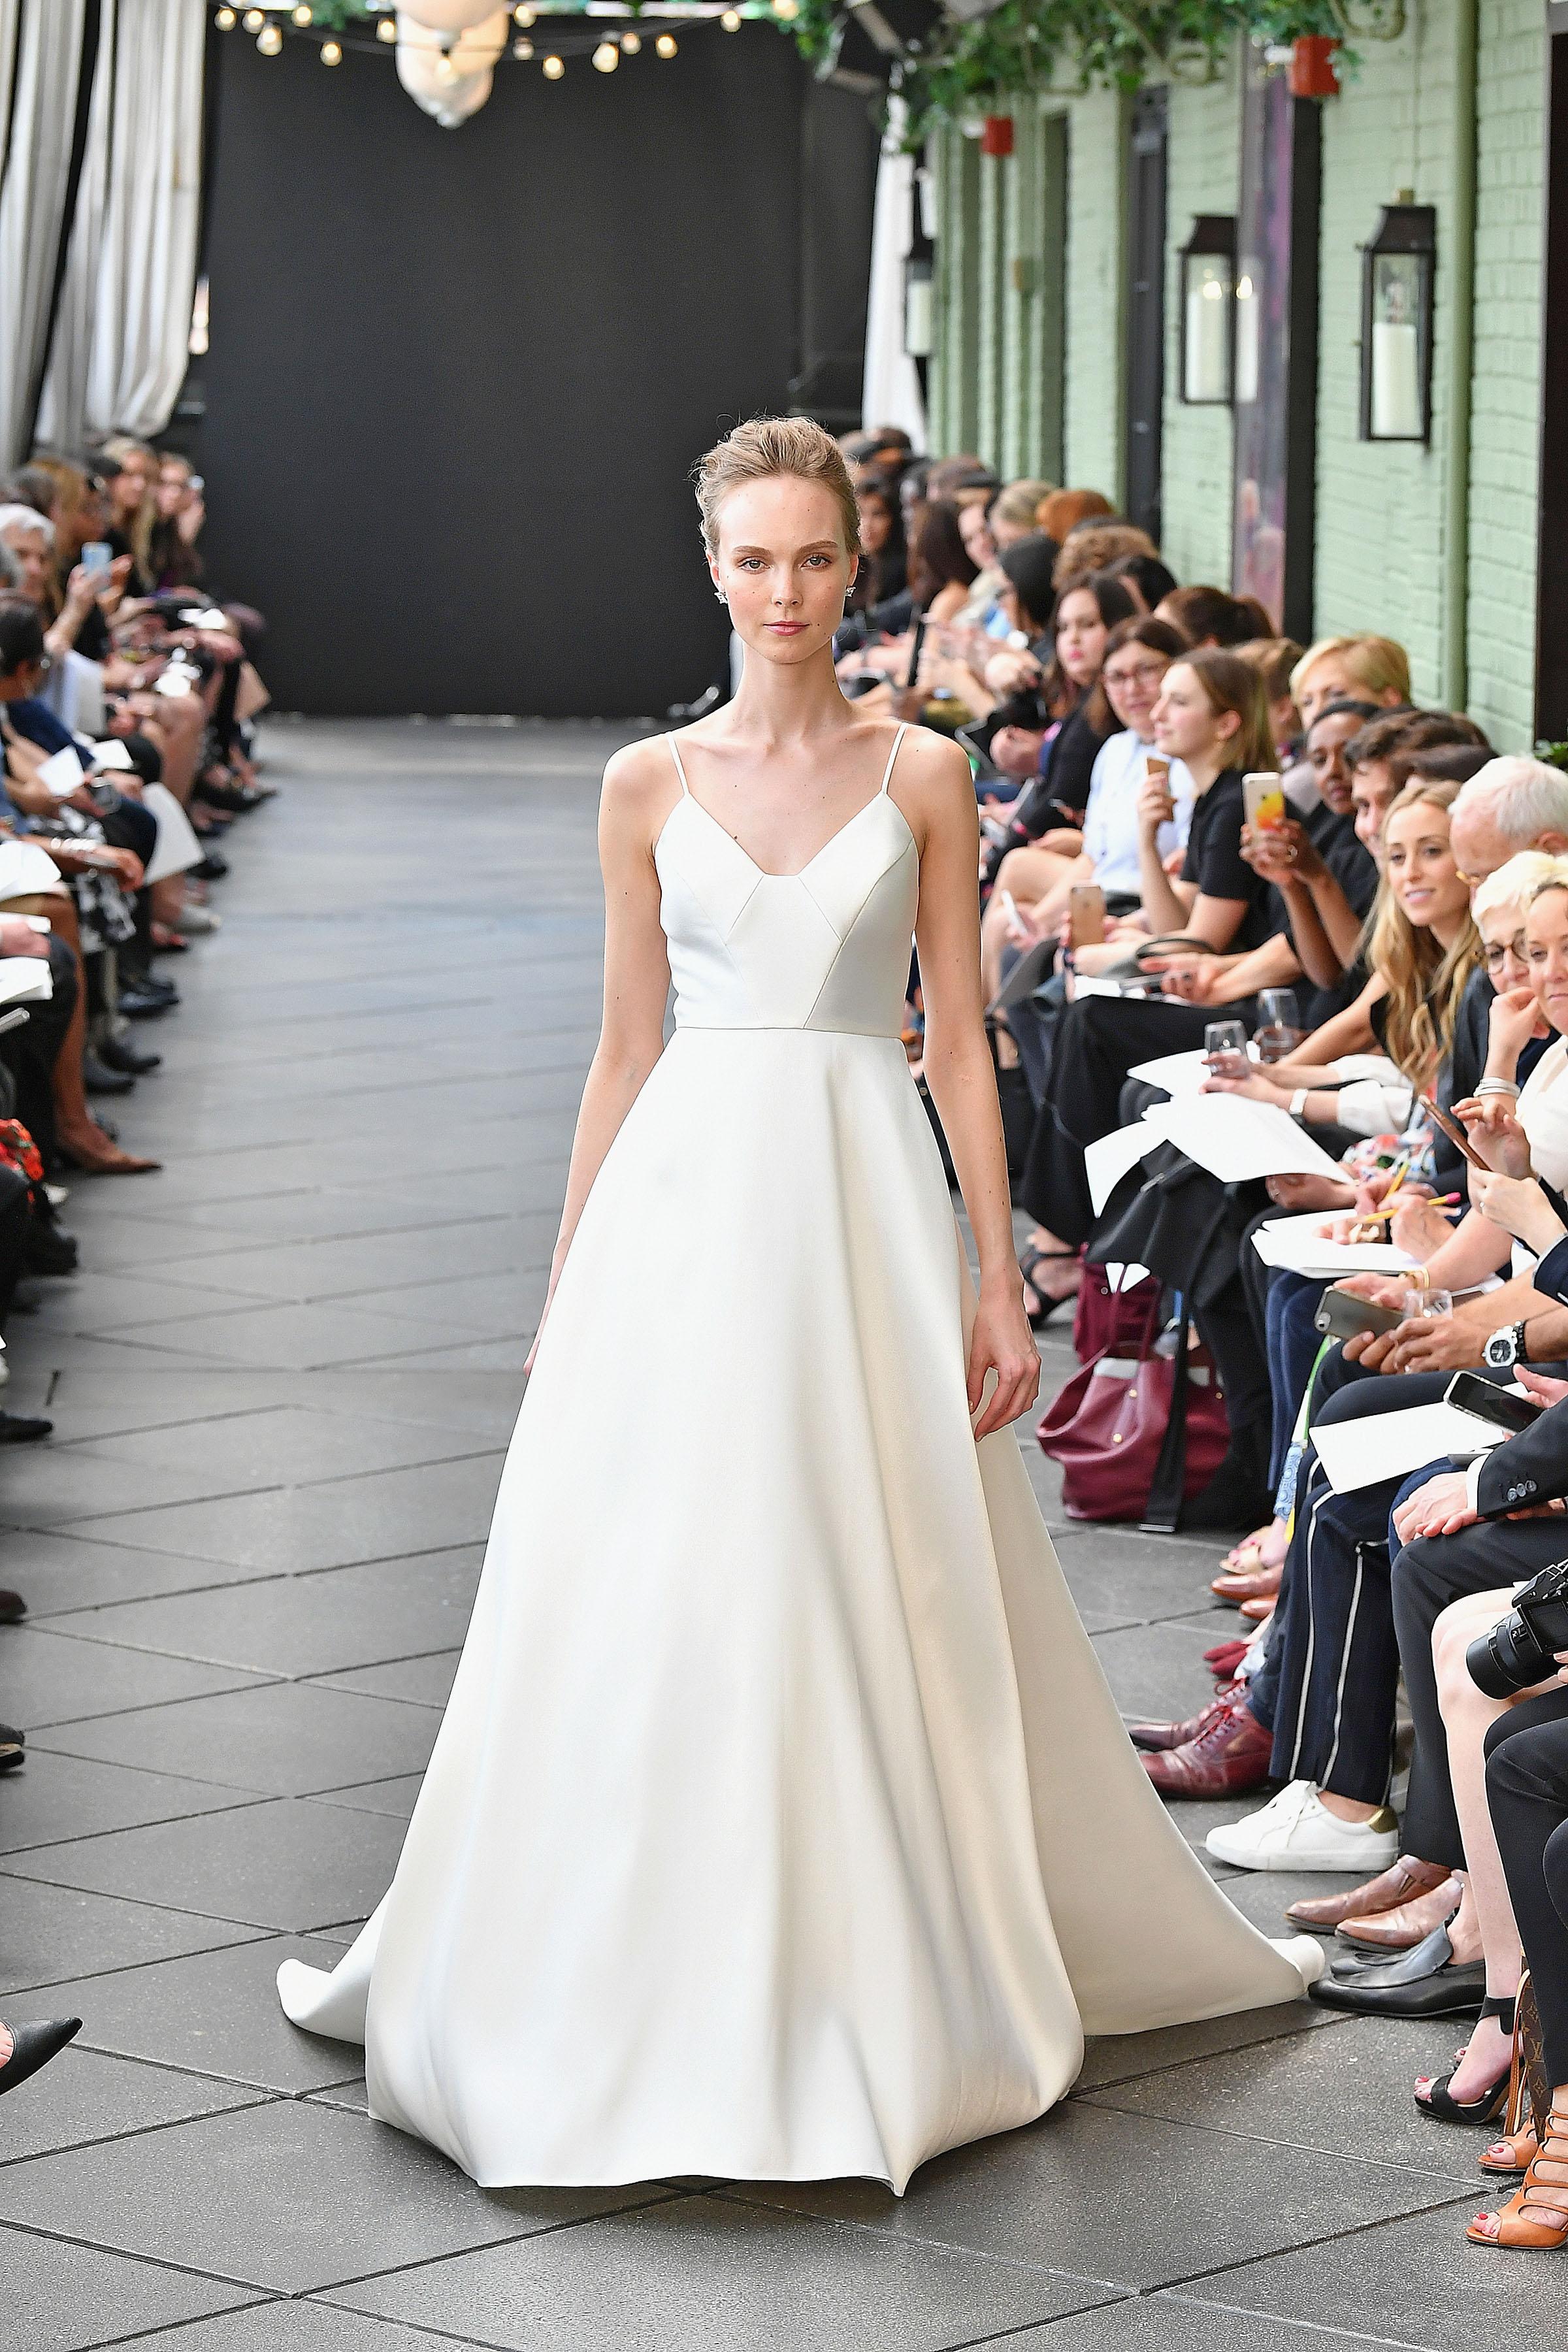 nouvelle amsale wedding dress spring 2019 spaghetti strap v-neck